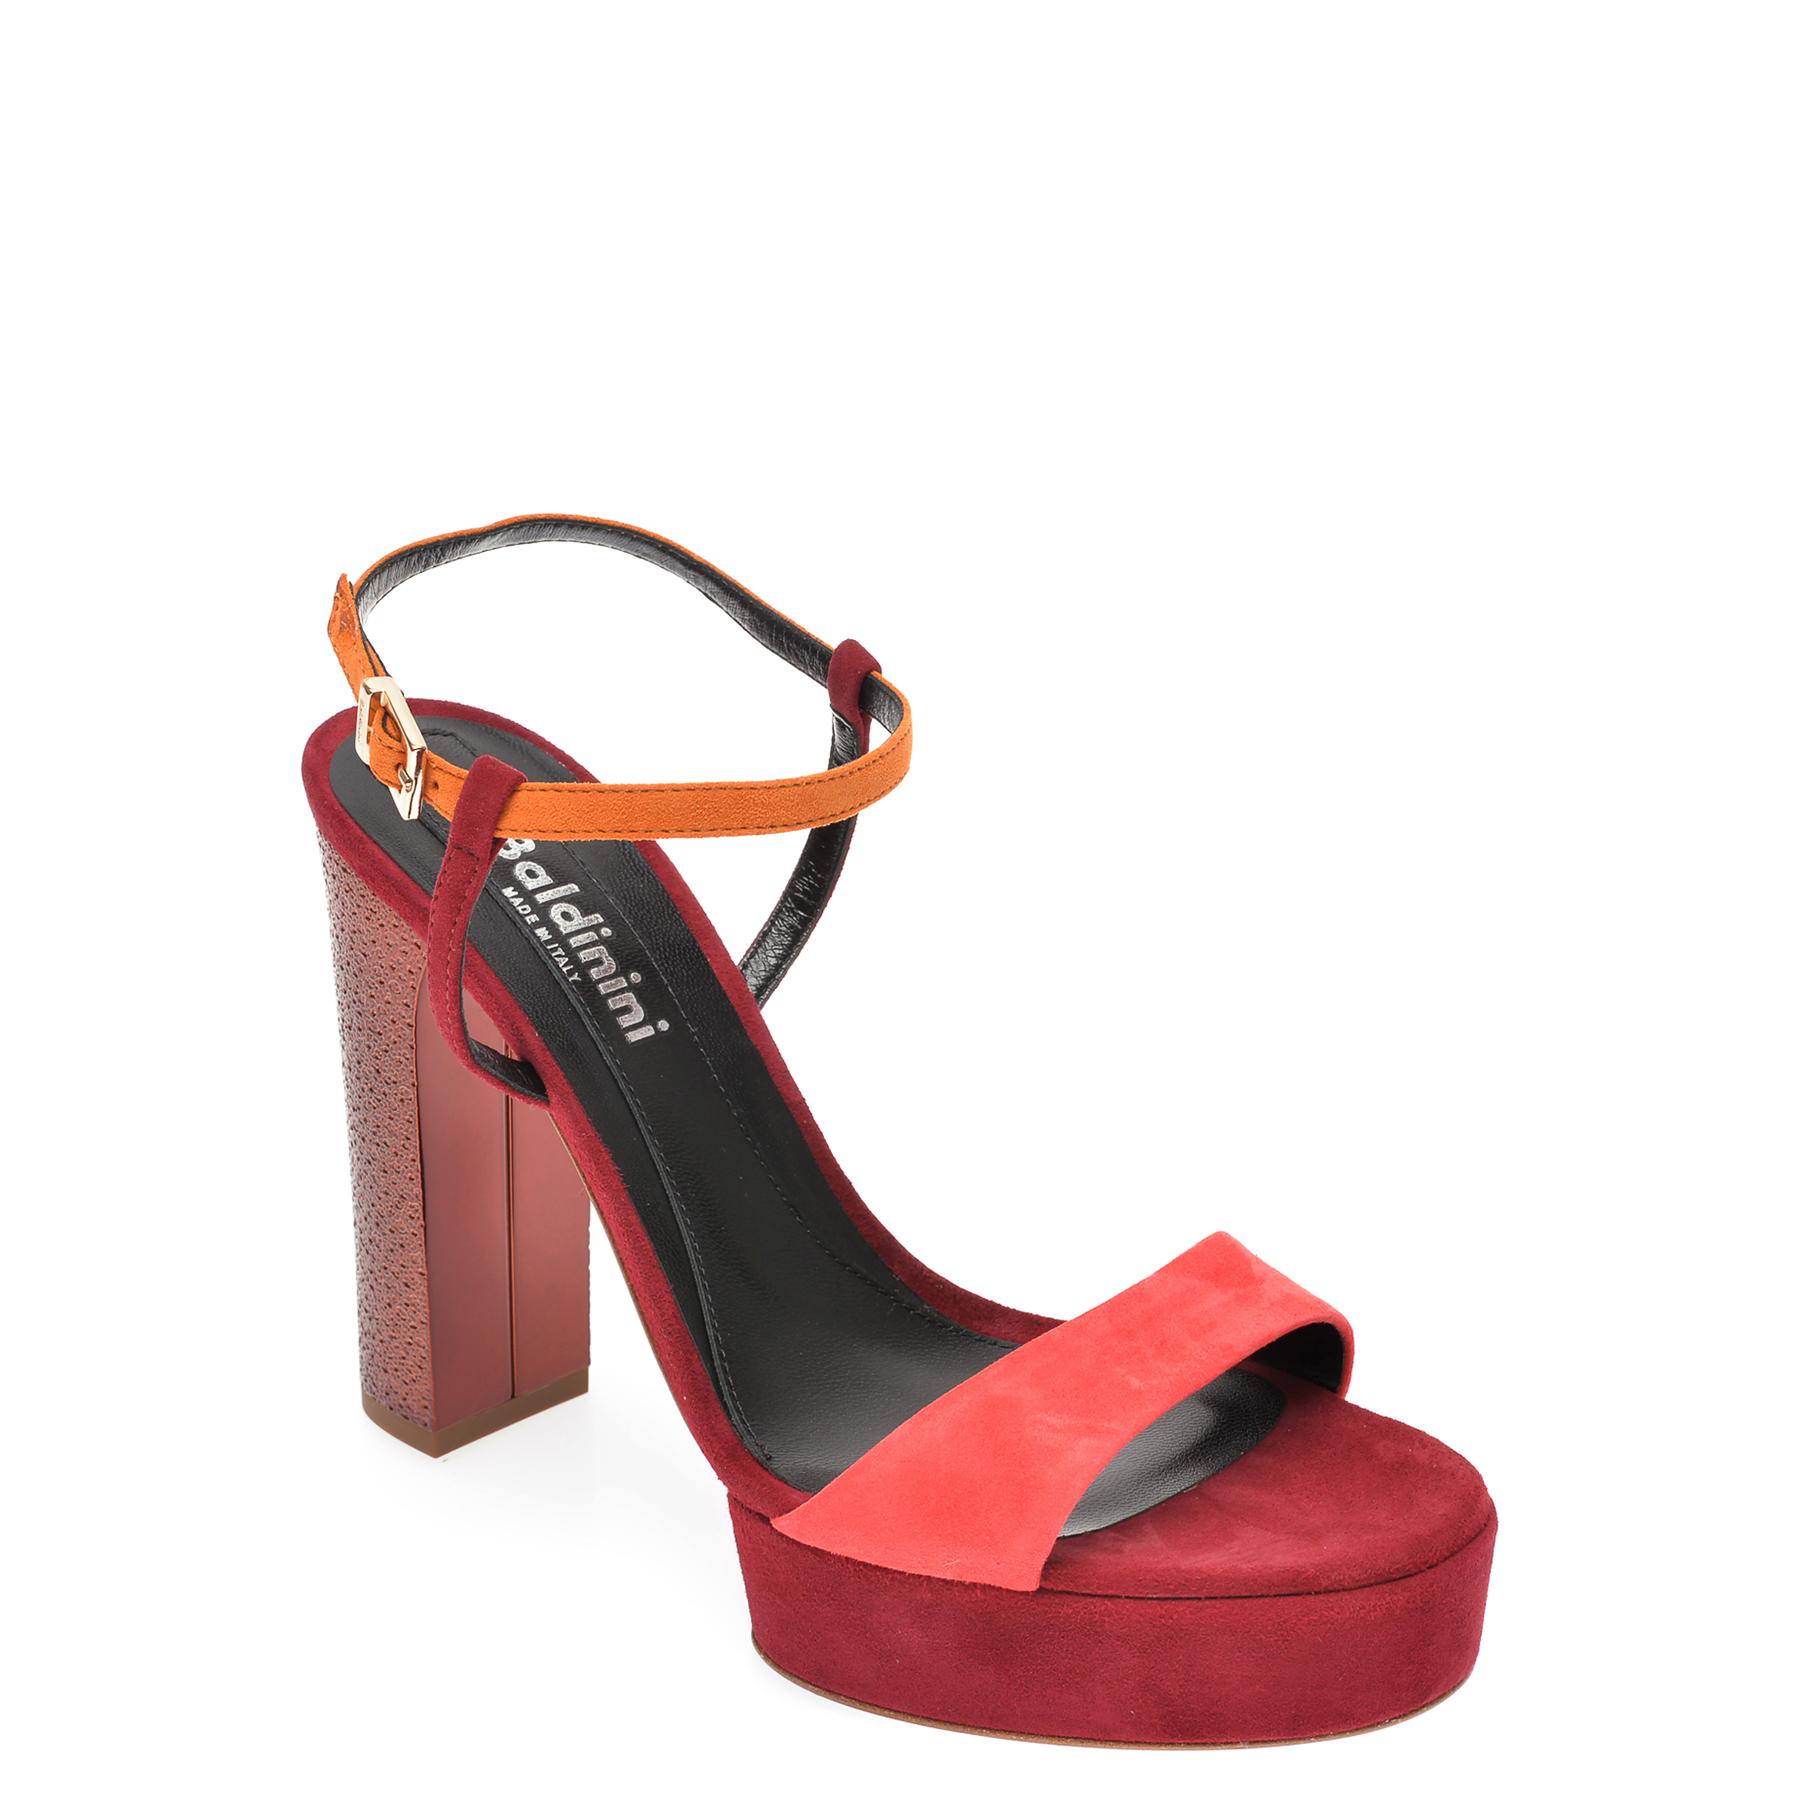 Sandale BALDININI rosii, 057010, din piele intoarsa